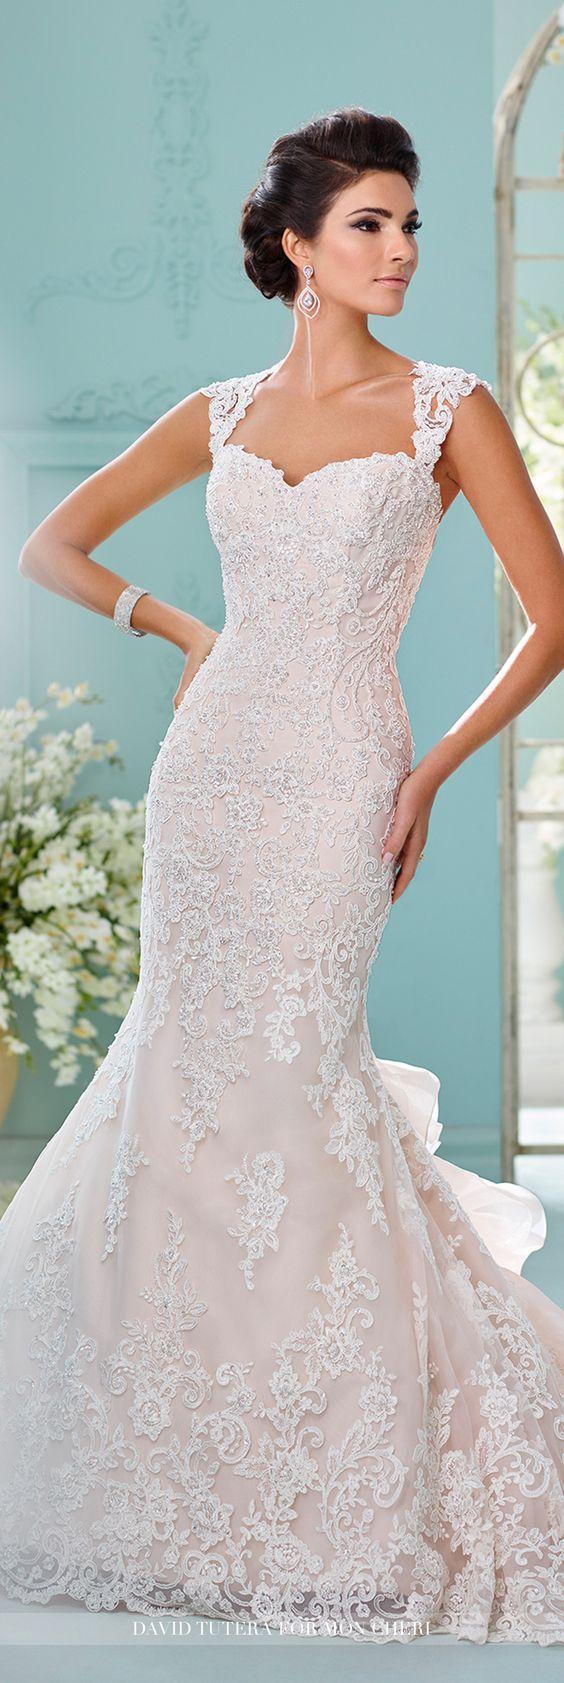 1000 ideas about queen anne neckline on pinterest for No back wedding dress